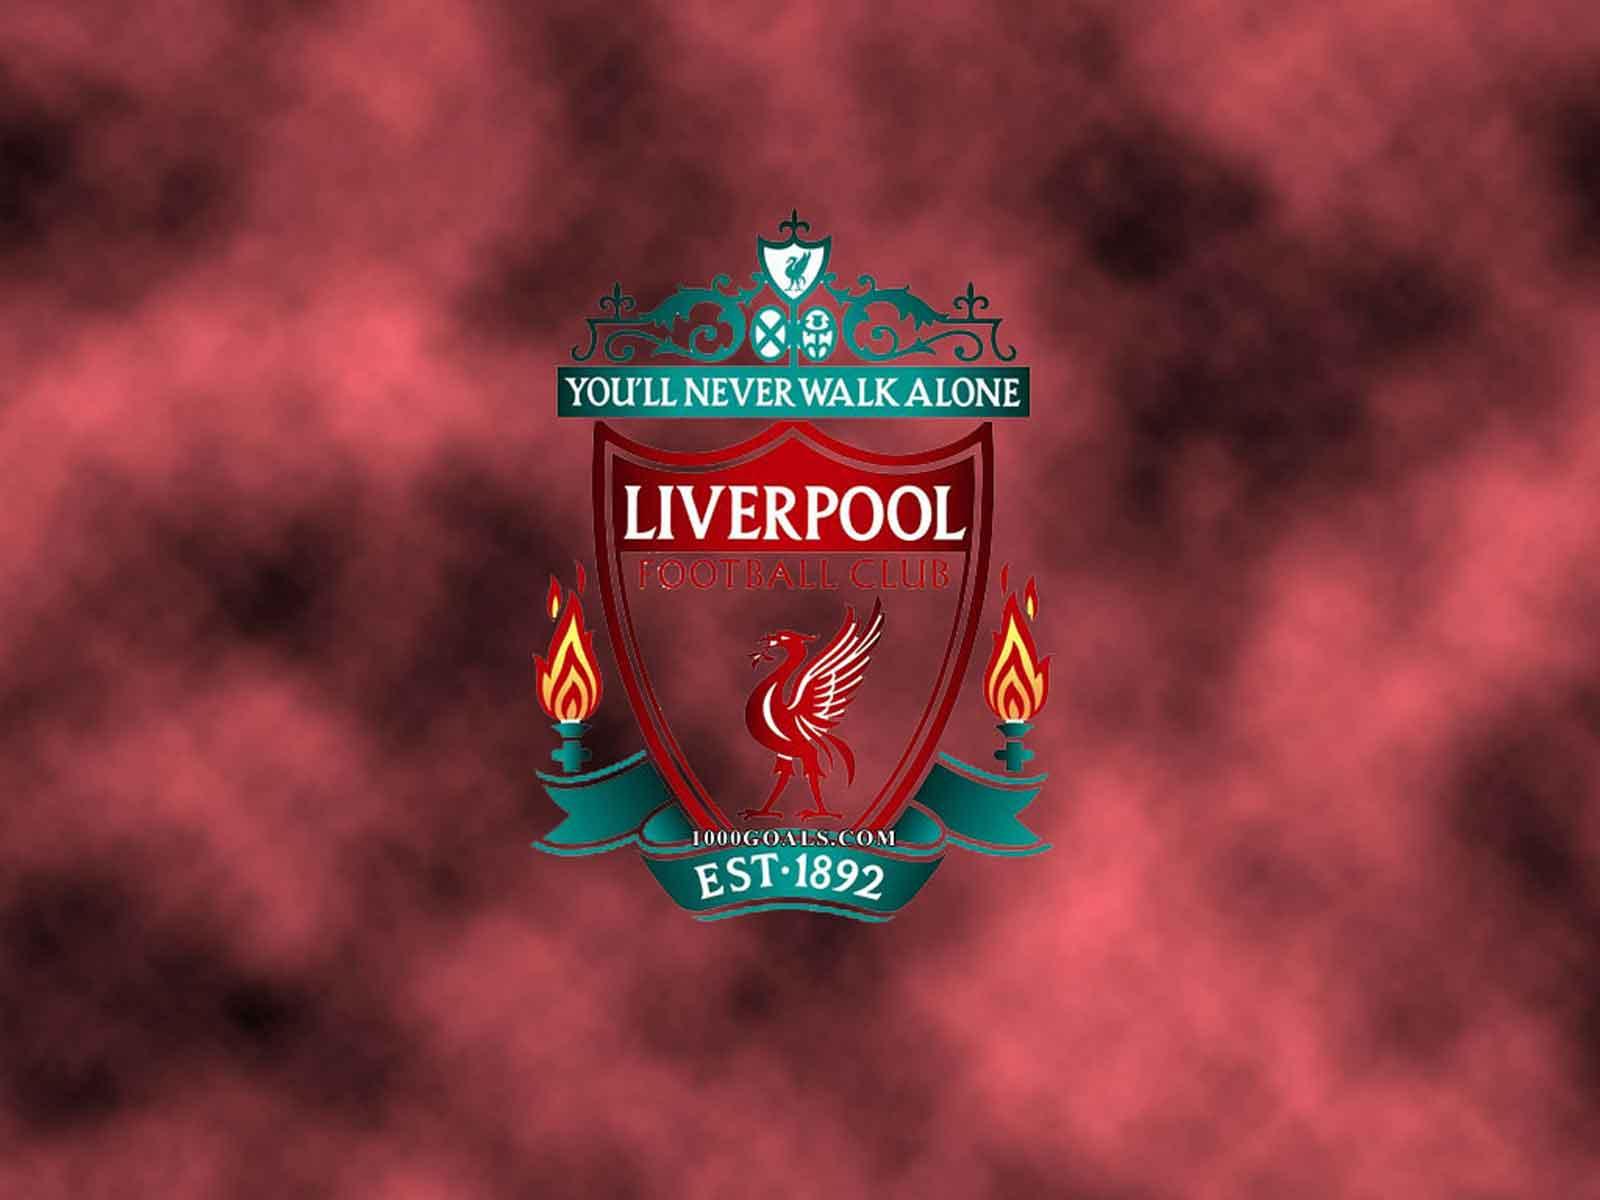 Liverpool: Fiona Apple: All Liverpool Logos